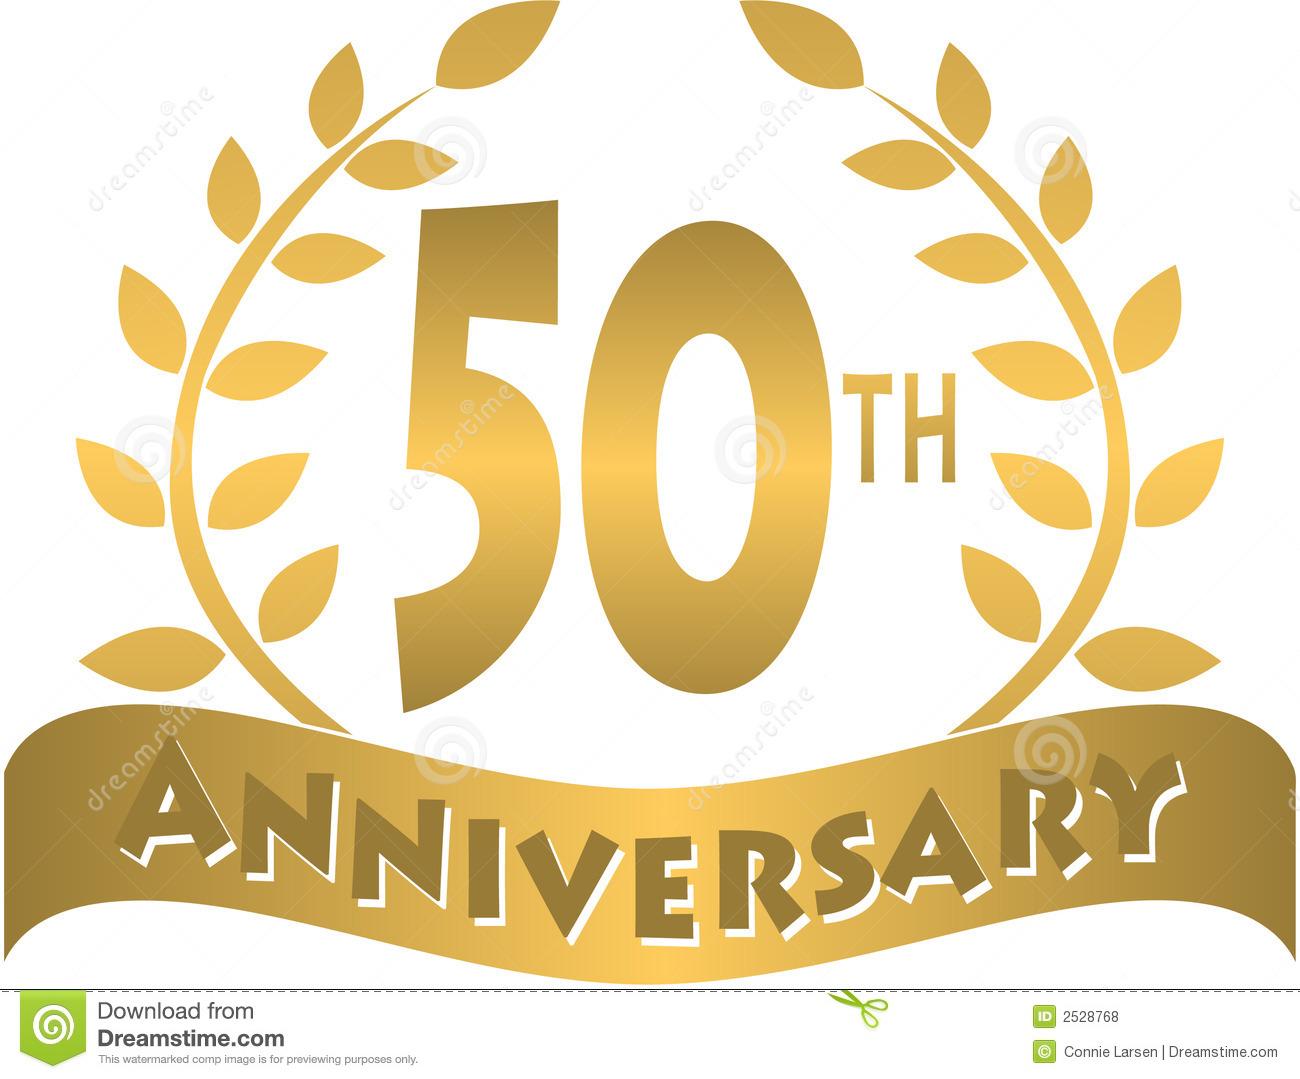 50th Anniversary Logo Clip Art Image Gal-50th Anniversary Logo Clip Art Image Galleries Imagekb Com-8